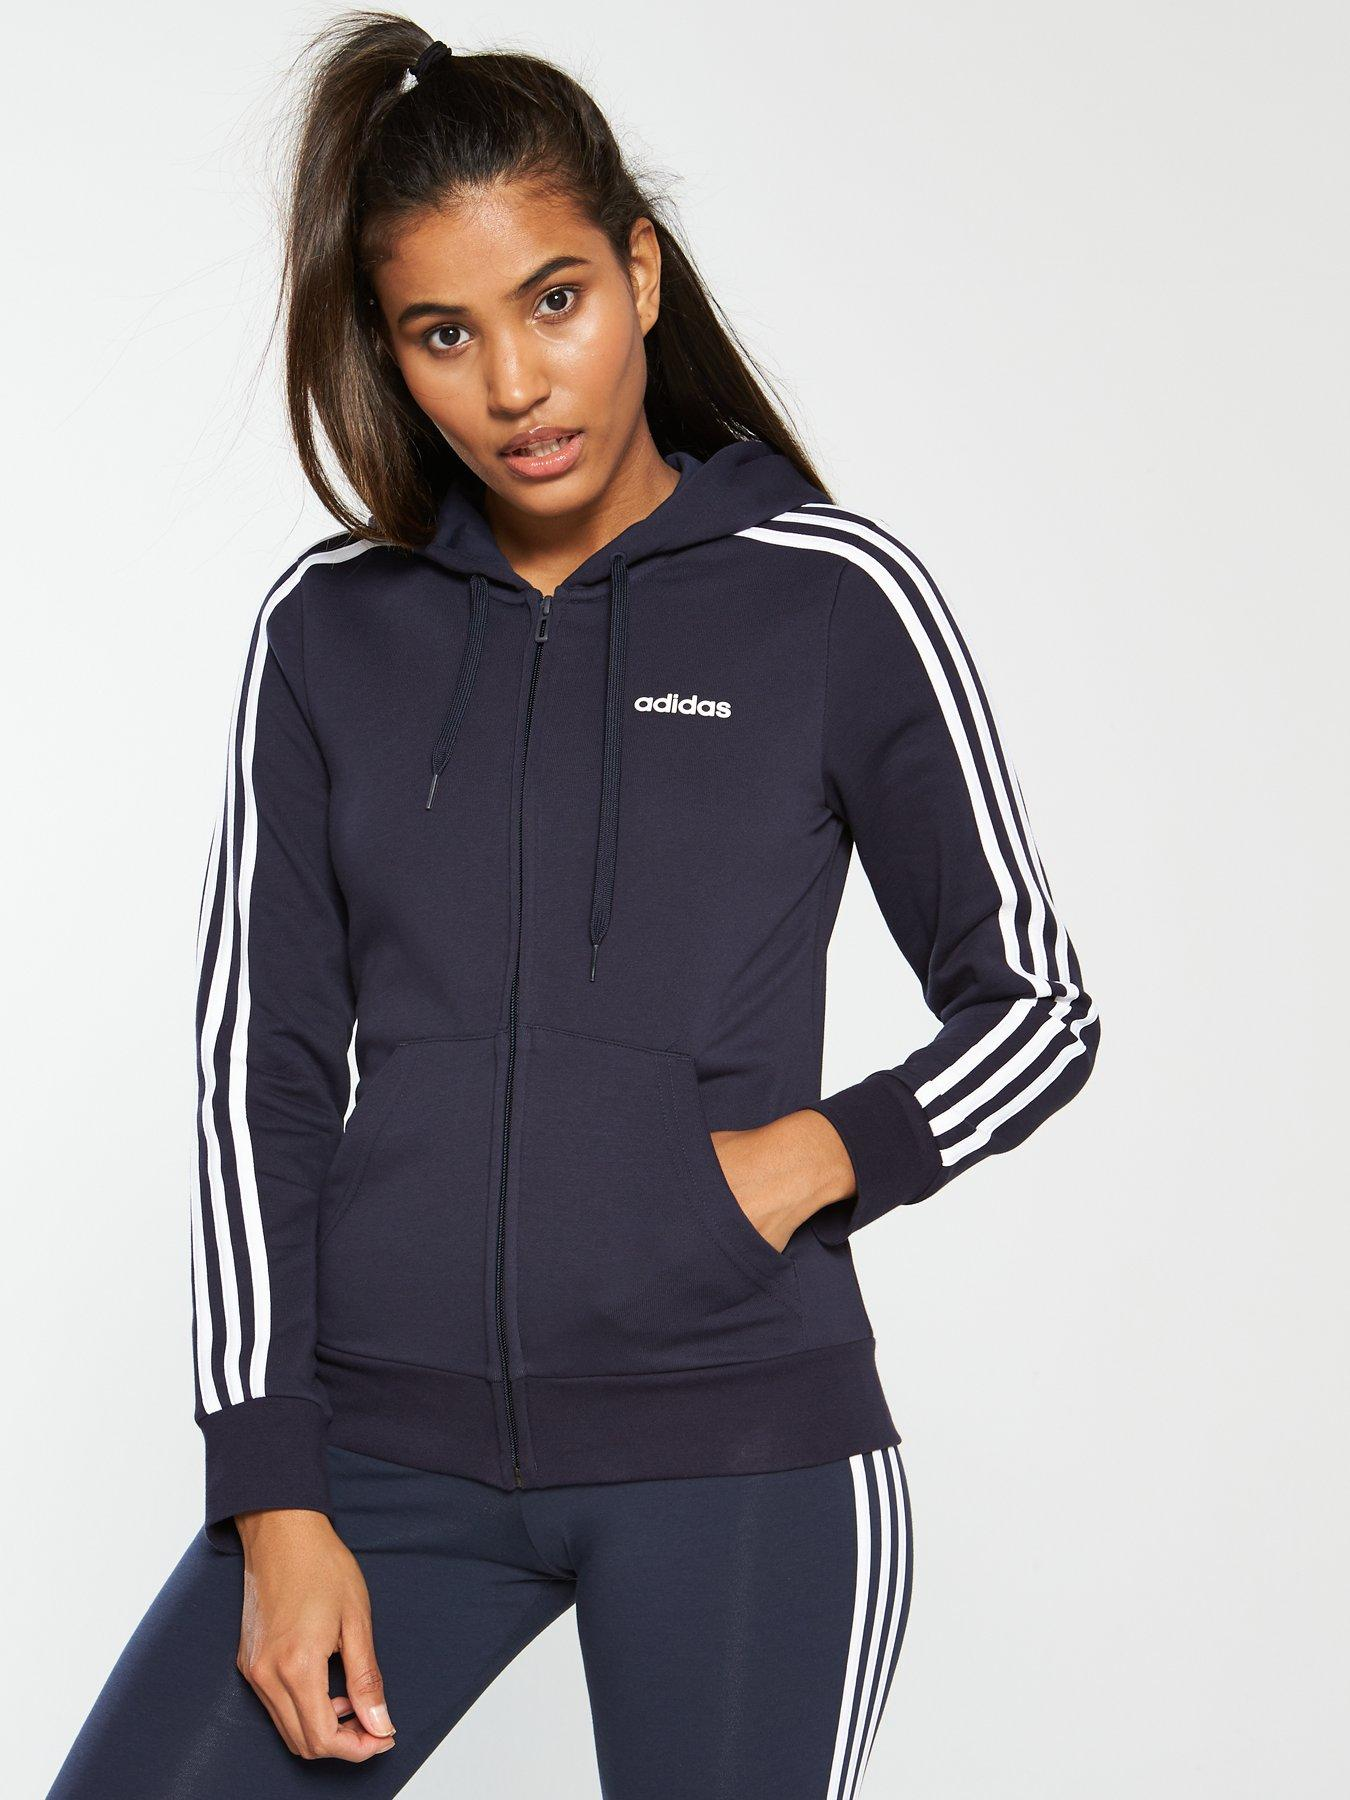 adidas Performance Mens 3 Stripe Classic Full Zip Jacket Tracksuit Set Black